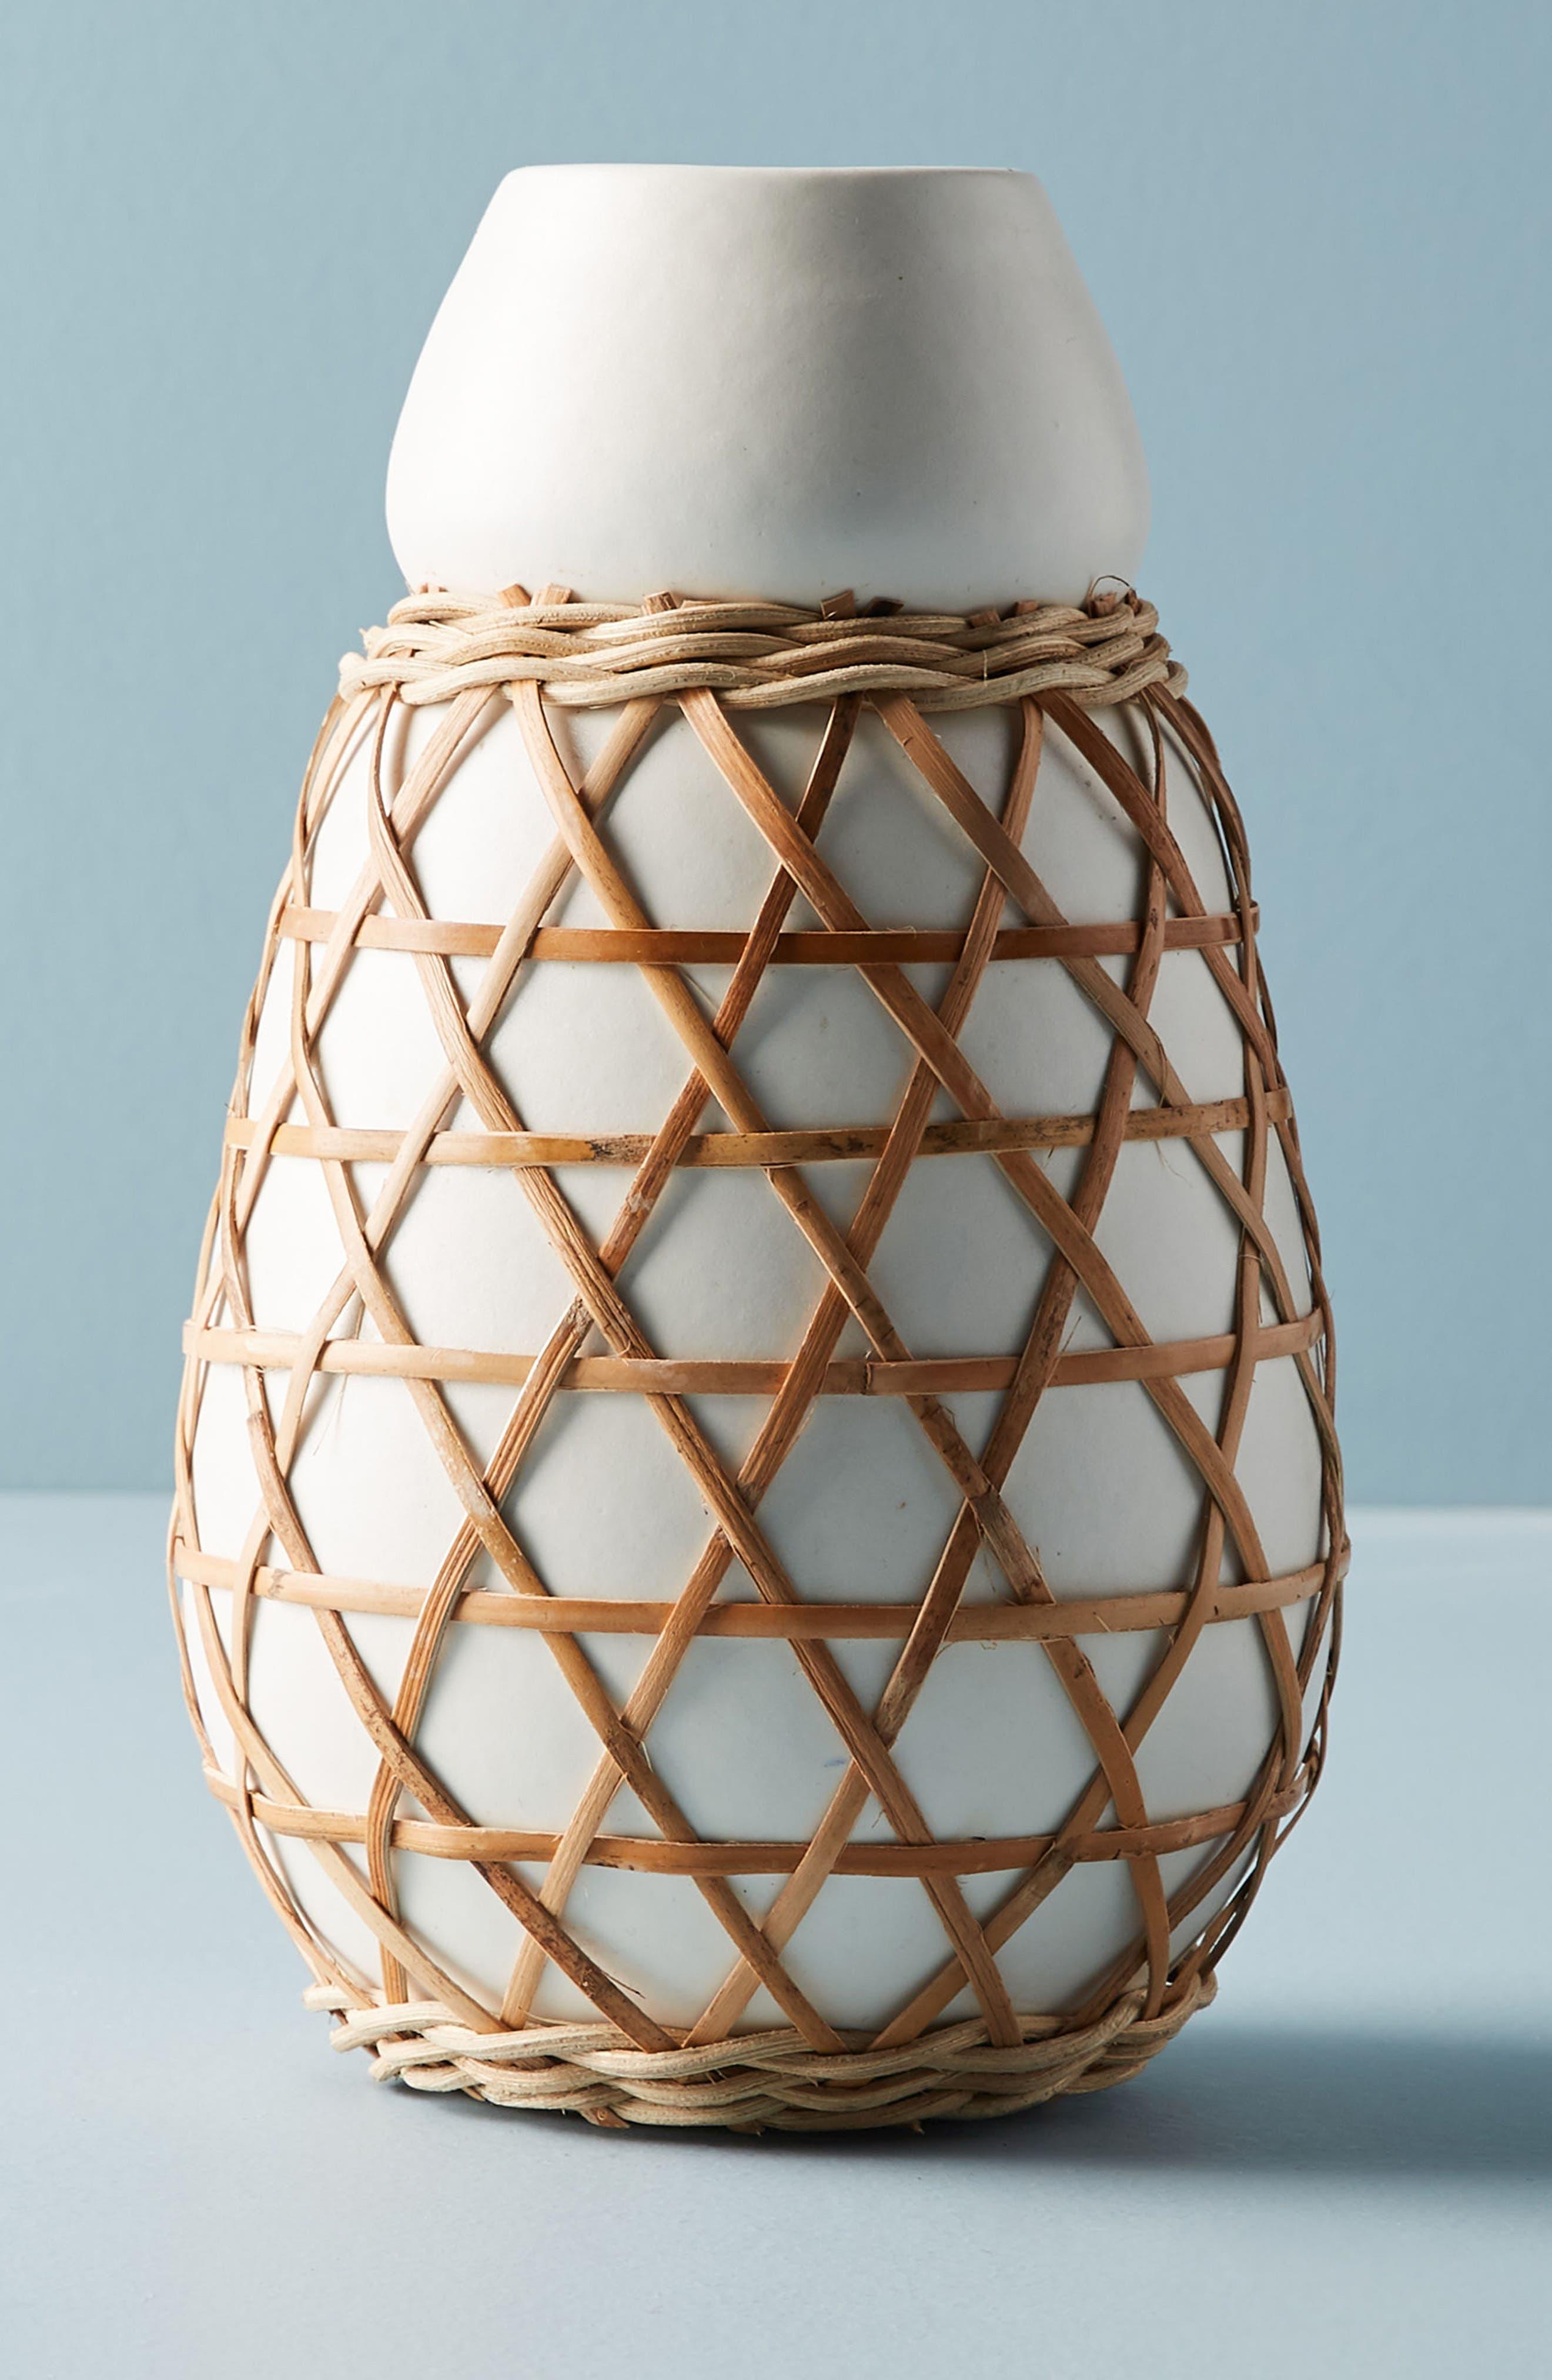 Woven Grass Vase,                             Main thumbnail 1, color,                             White